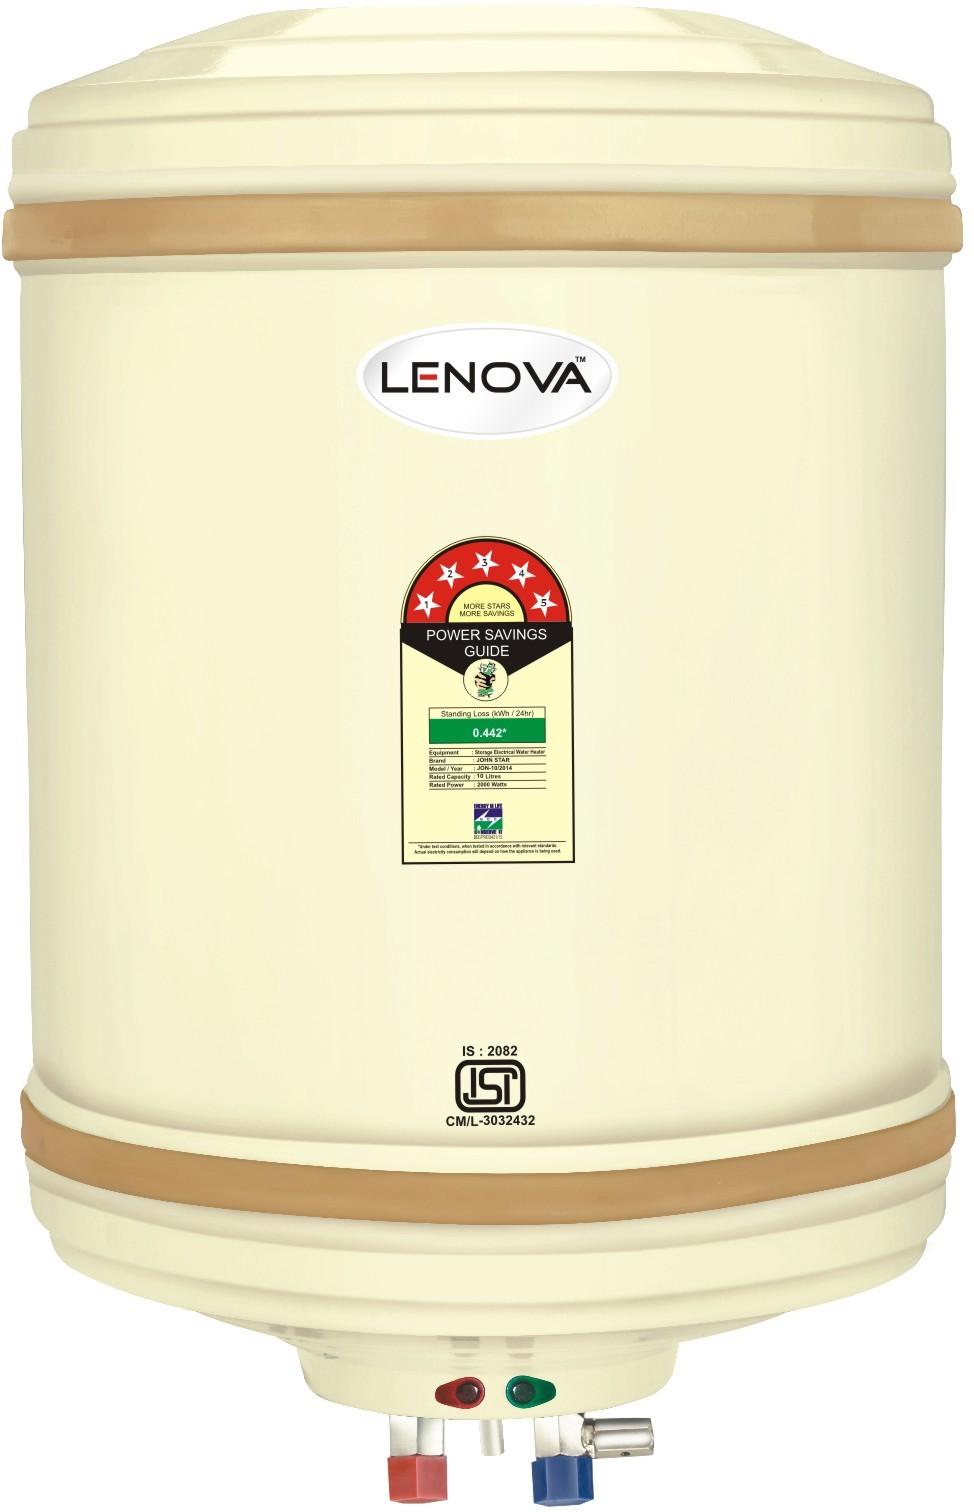 50 Ltr Water Heater